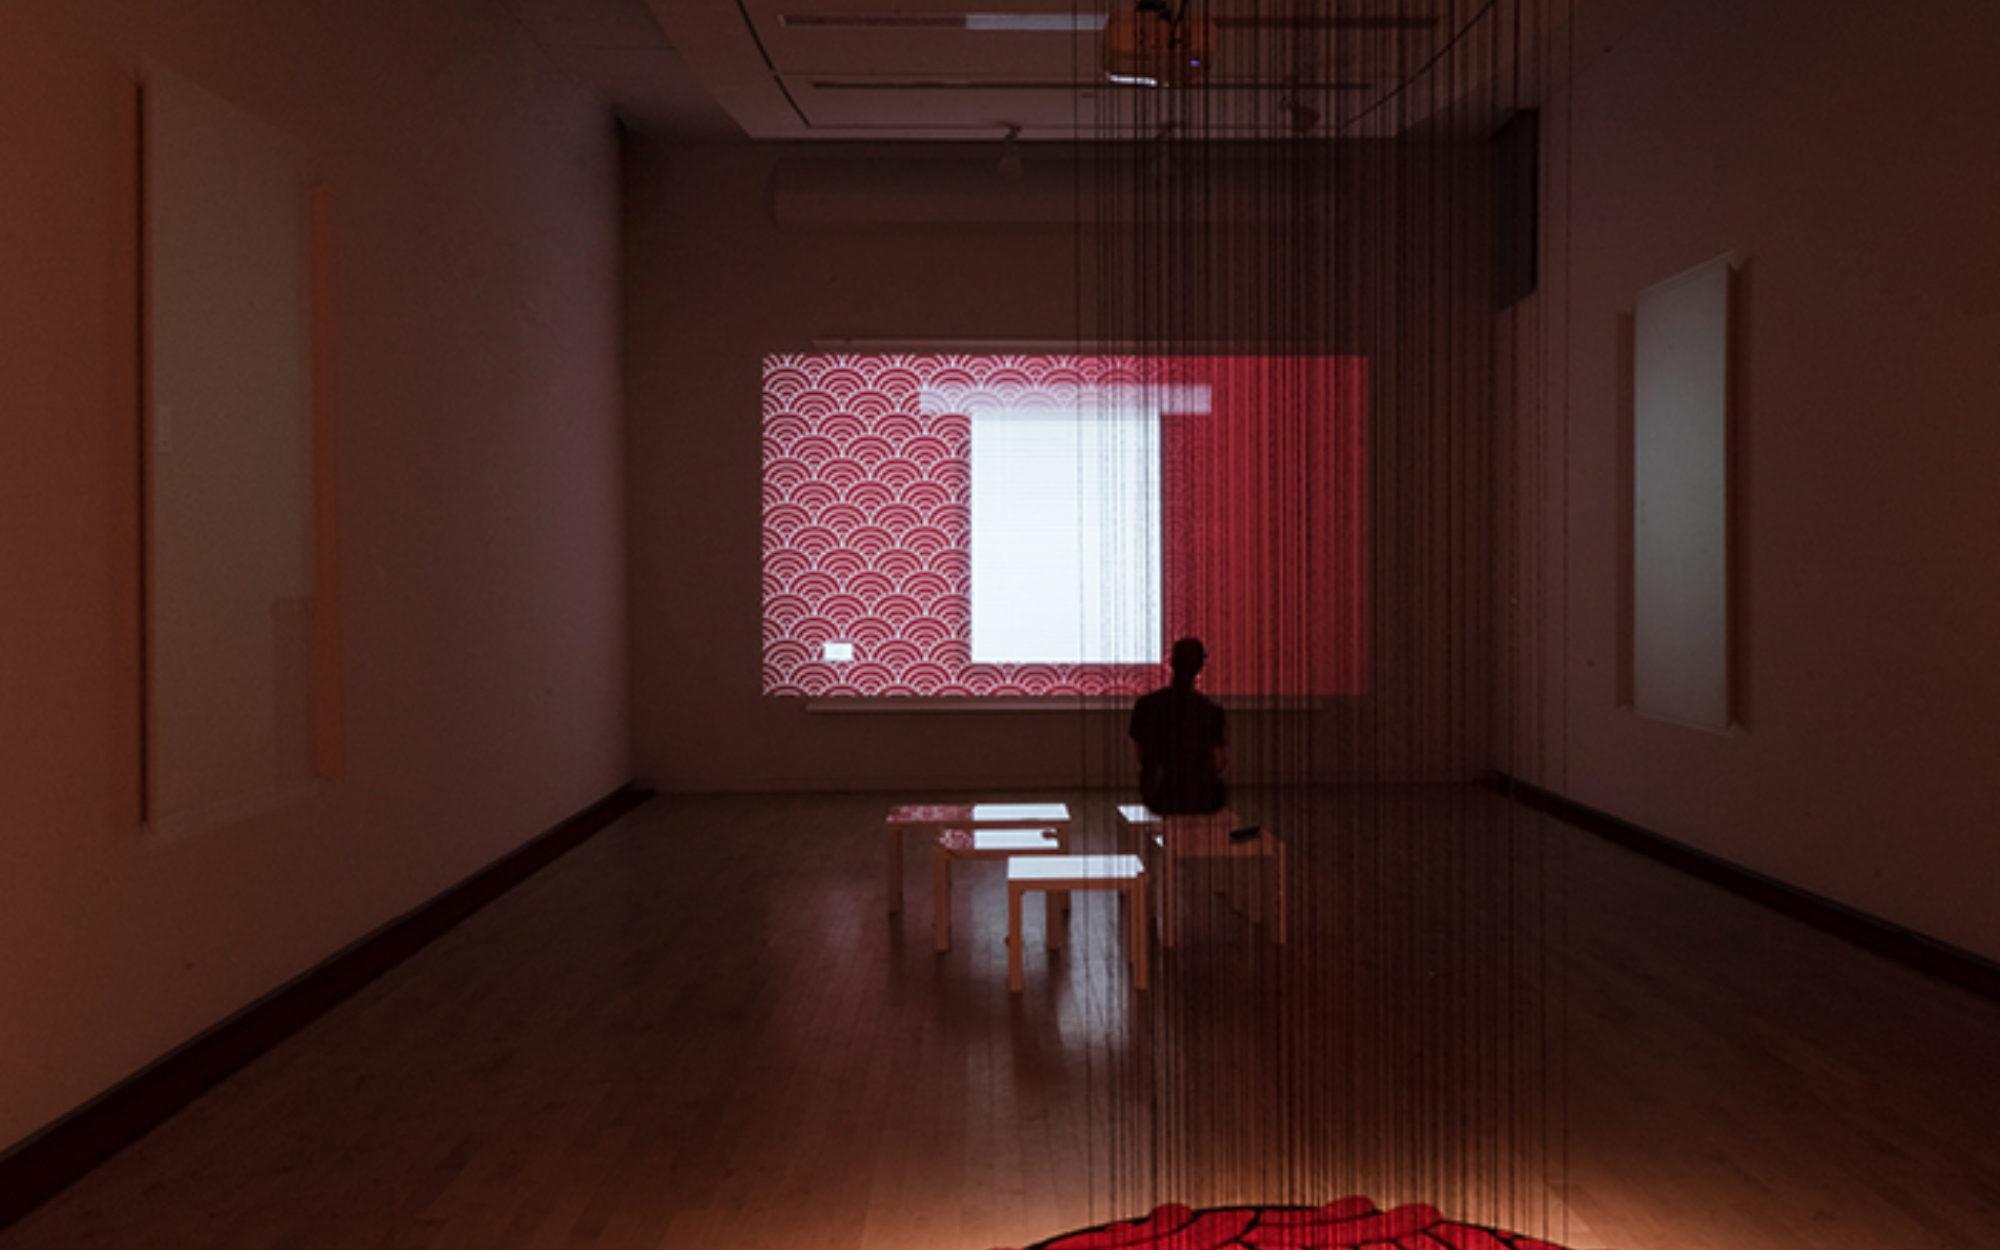 Visitor in gallery views Analia Segal's work